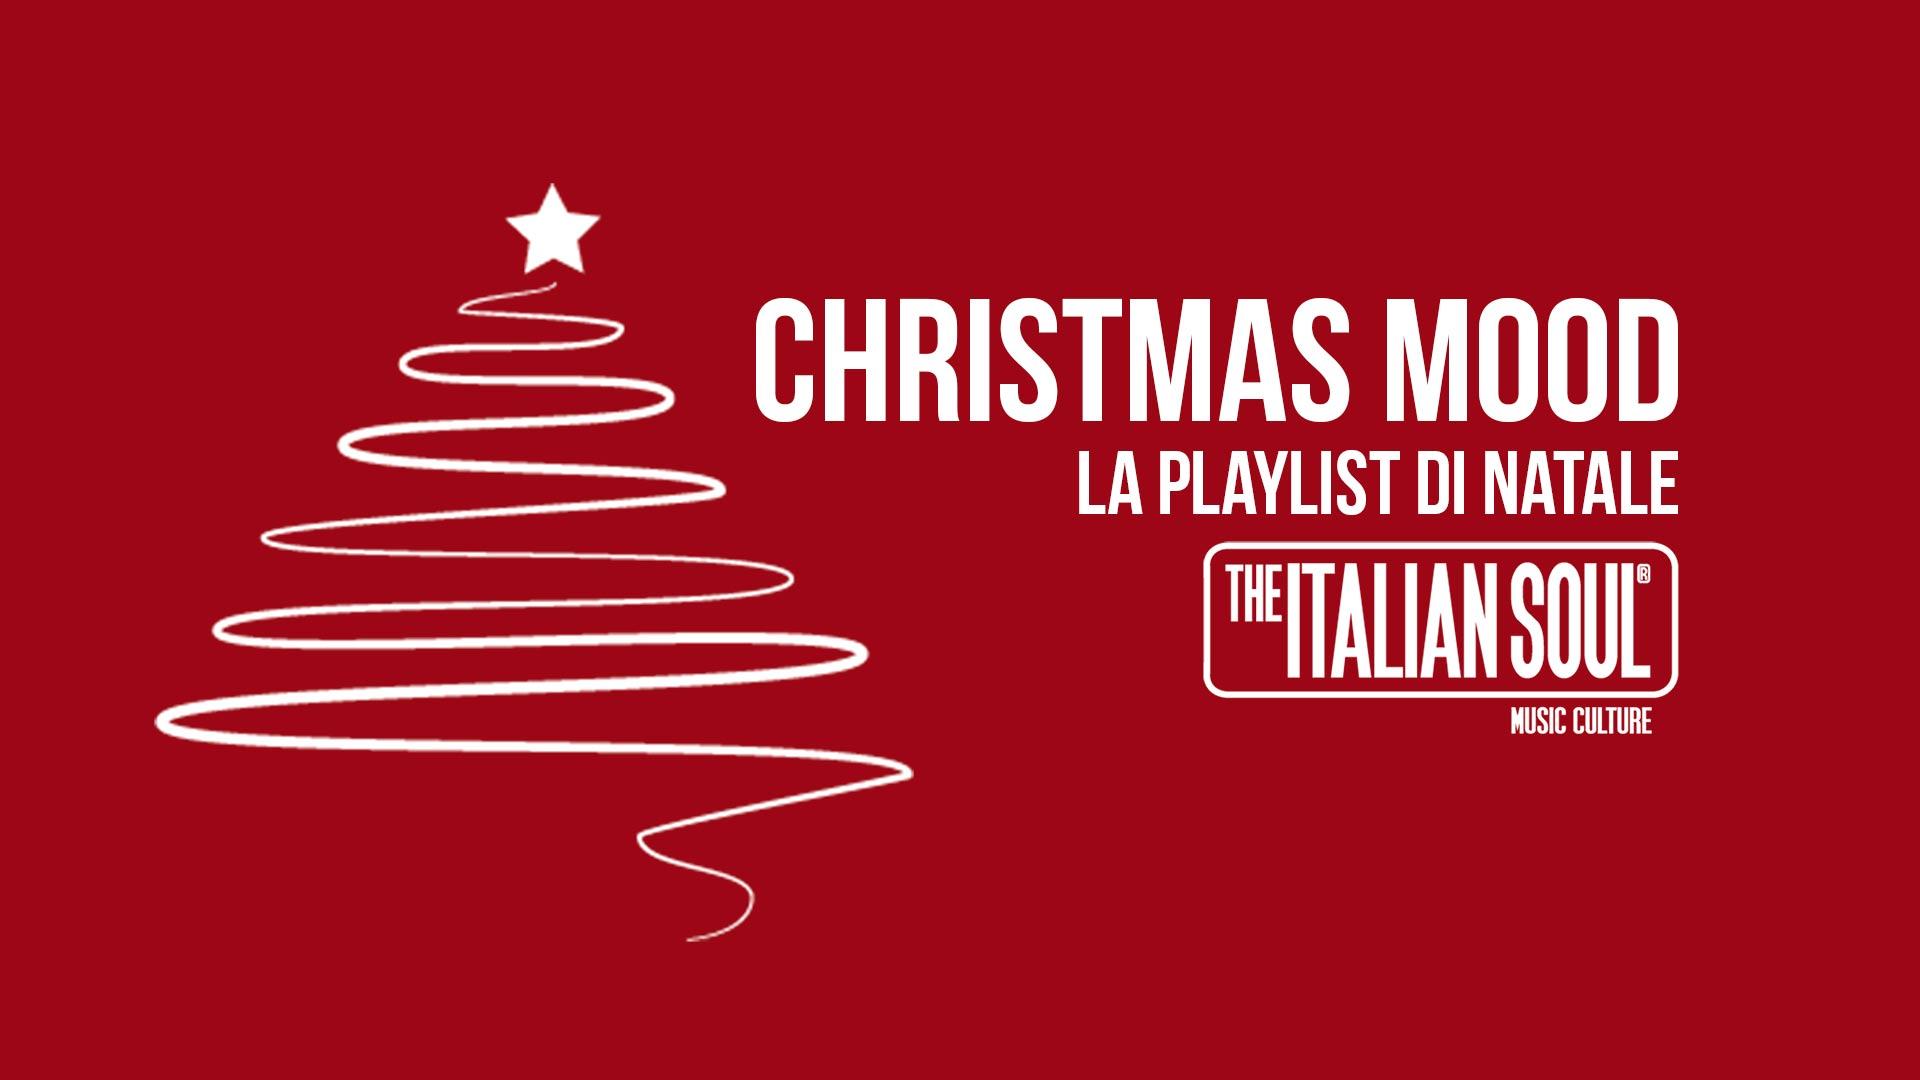 Christmast Mood - The Italian Soul